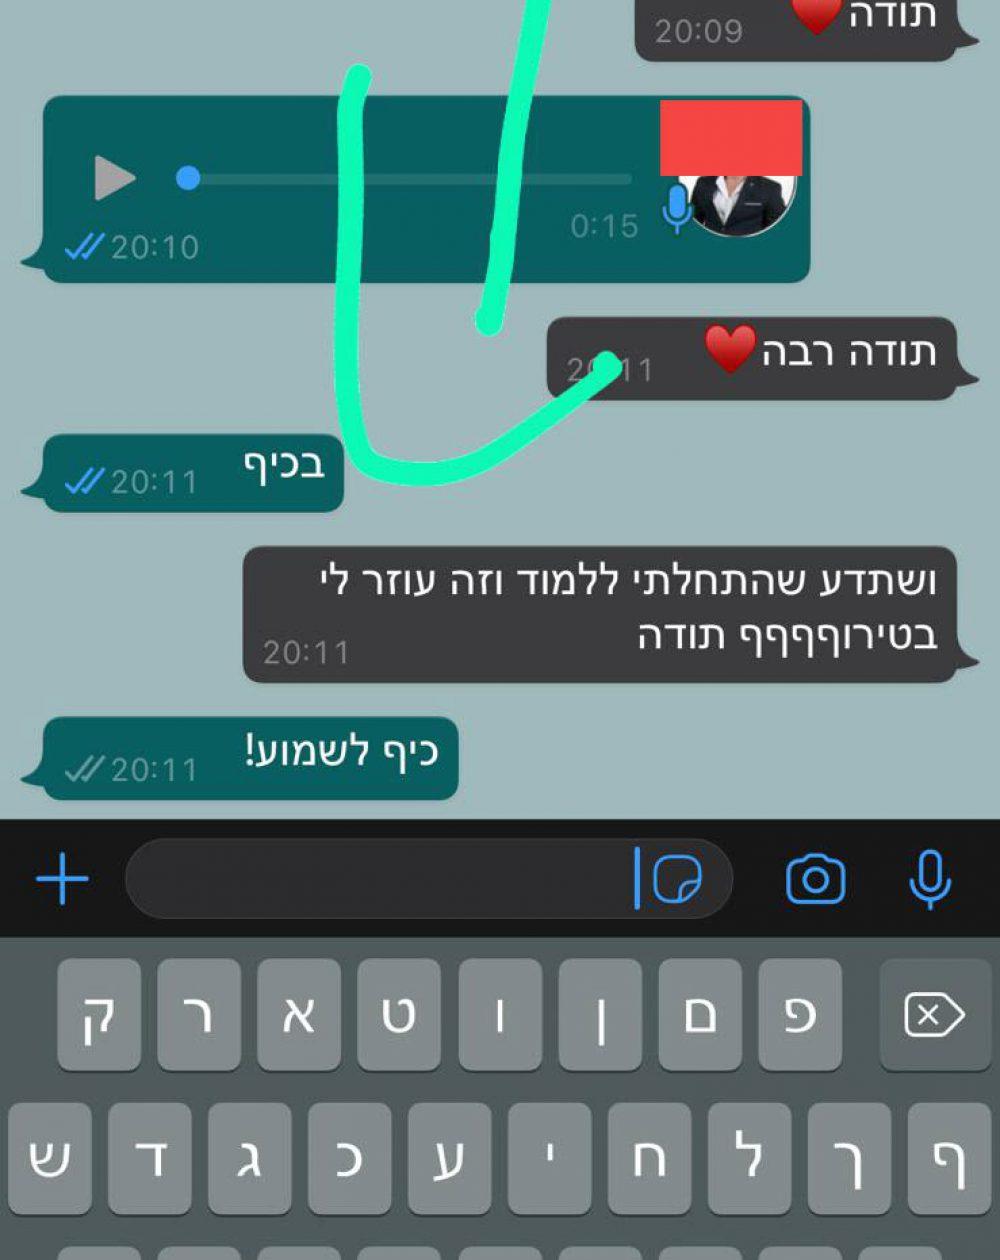 WhatsApp Image 2021-08-16 at 15.00.58-recomanded